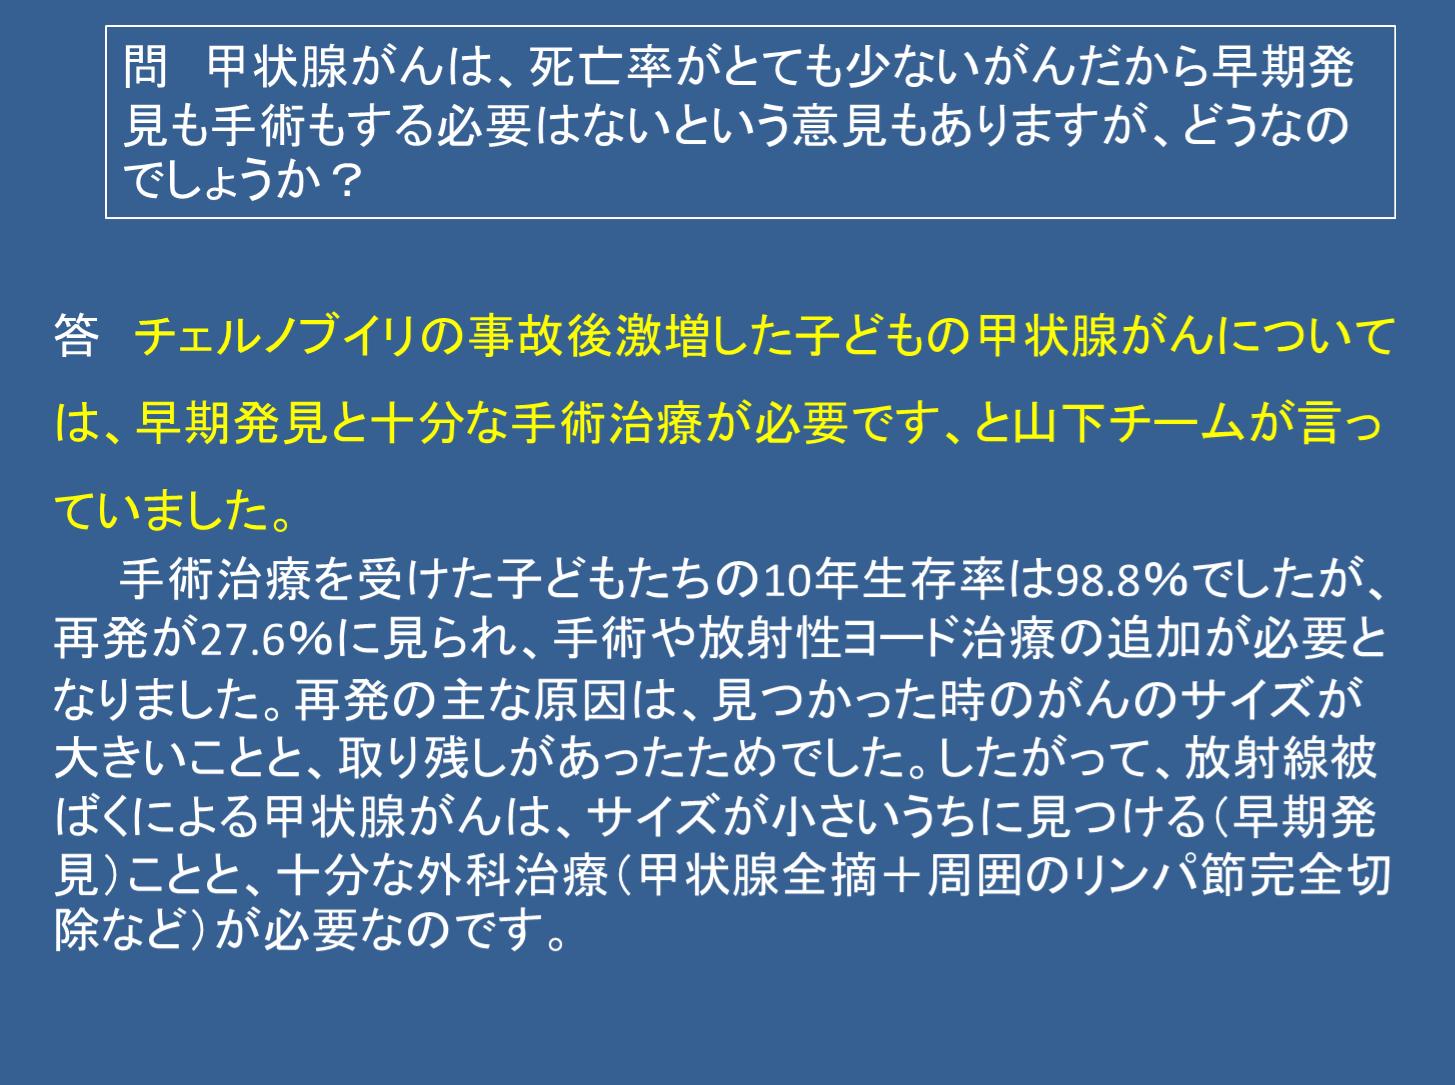 DrMatsuzaki028.png